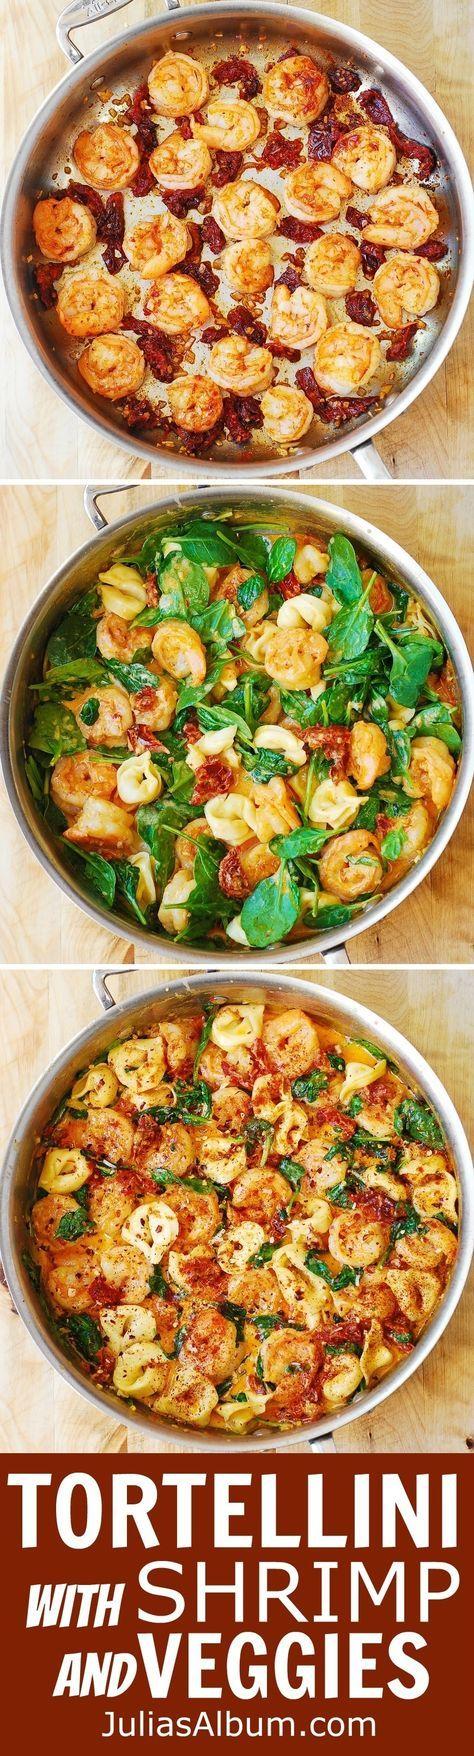 Creamy Tortellini with Shrimp and Veggies (pasta, dinner, vegetables)